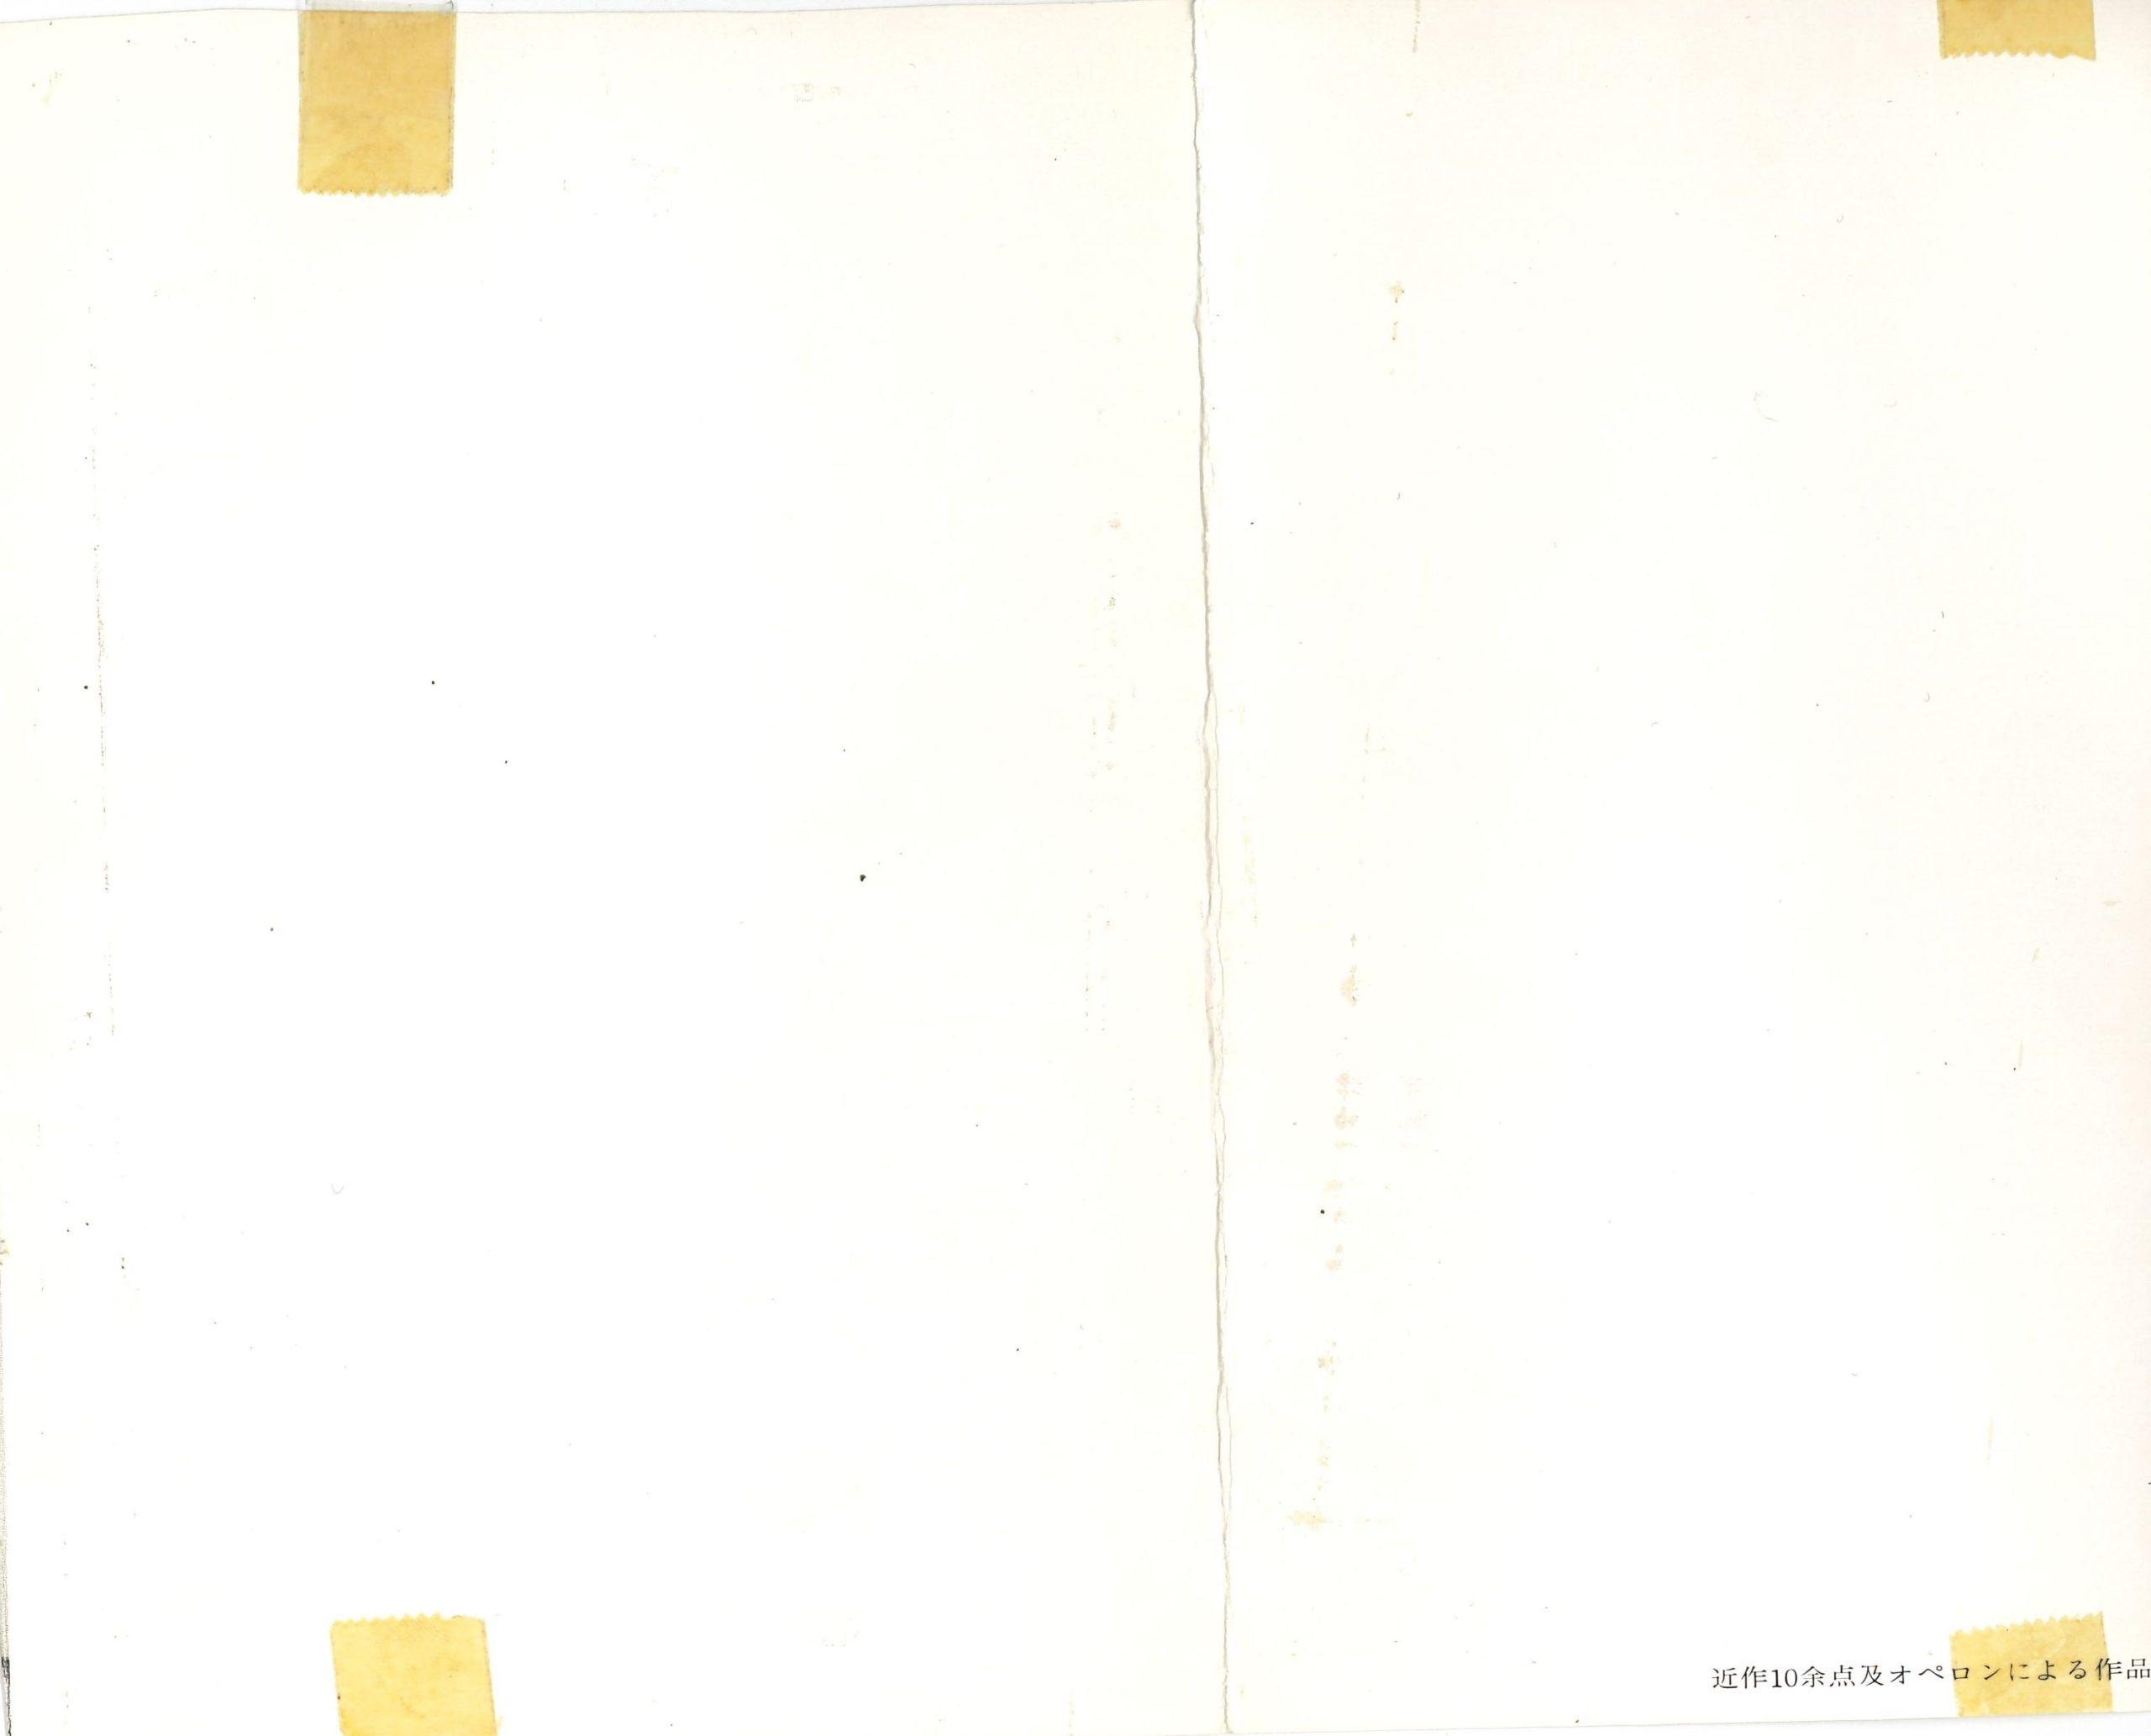 GUTAI PINACOTECA, 1.Juli -10.Juli. 1966,  Osaka (Announcement); Archiv der Avantgarden, Staatliche Kunstsammlungen Dresden